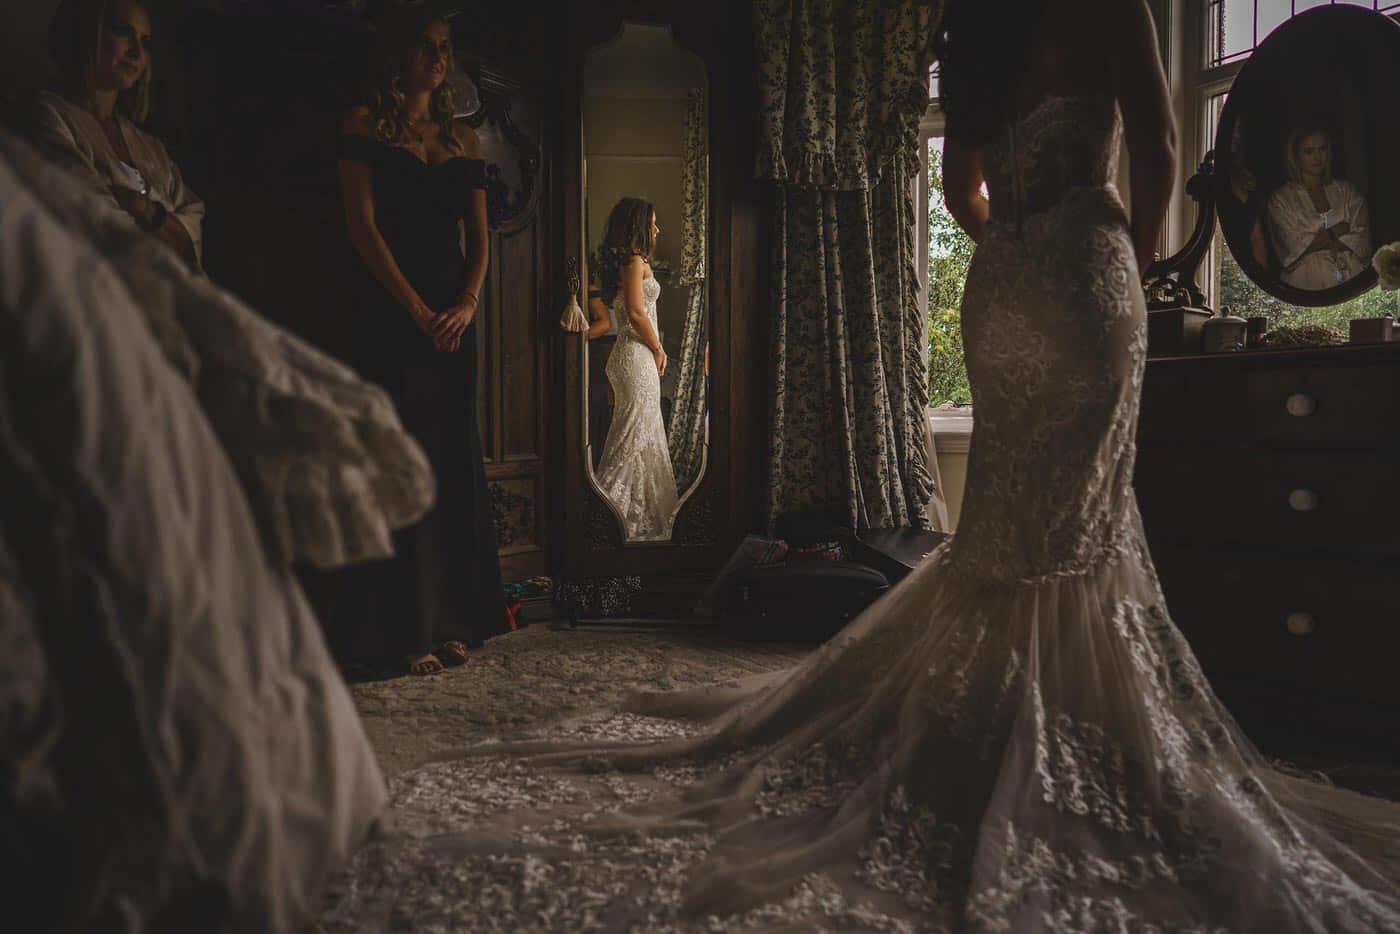 WEDDING PHOTOGRAPHER IN SHROPSHIRE 263